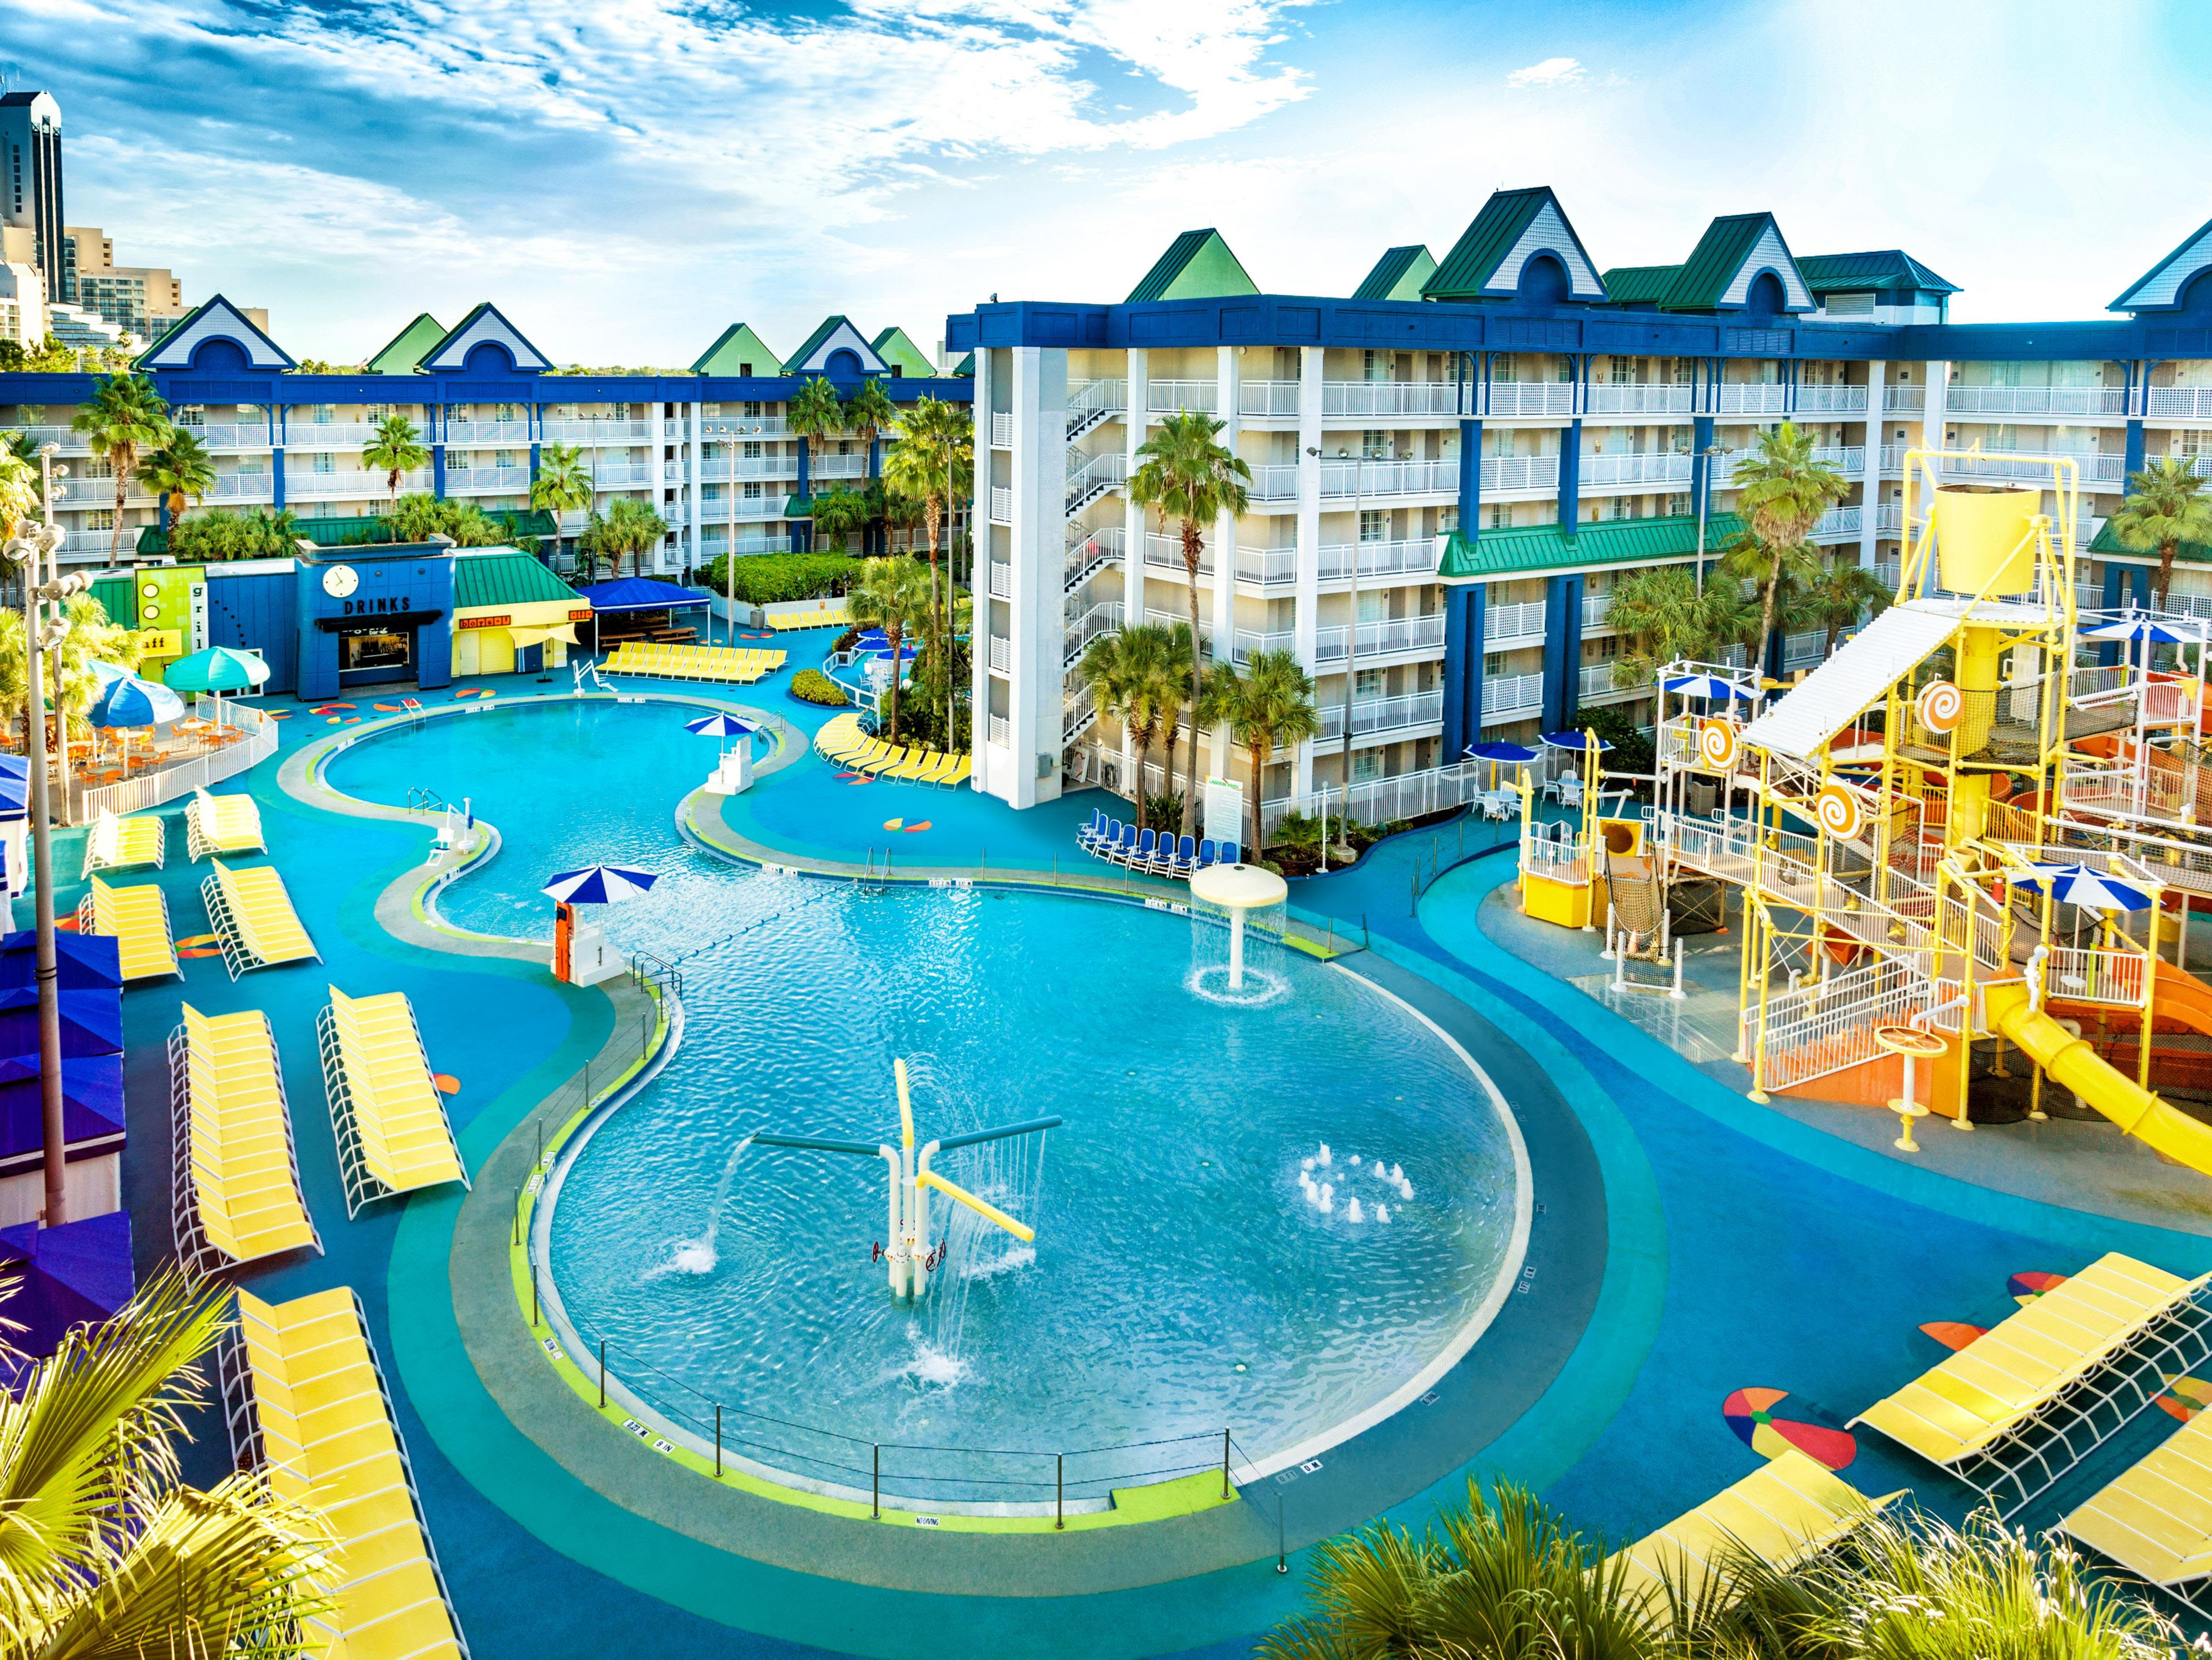 Holiday Inn Resort Orlando Suites  Waterpark Hotel by IHG